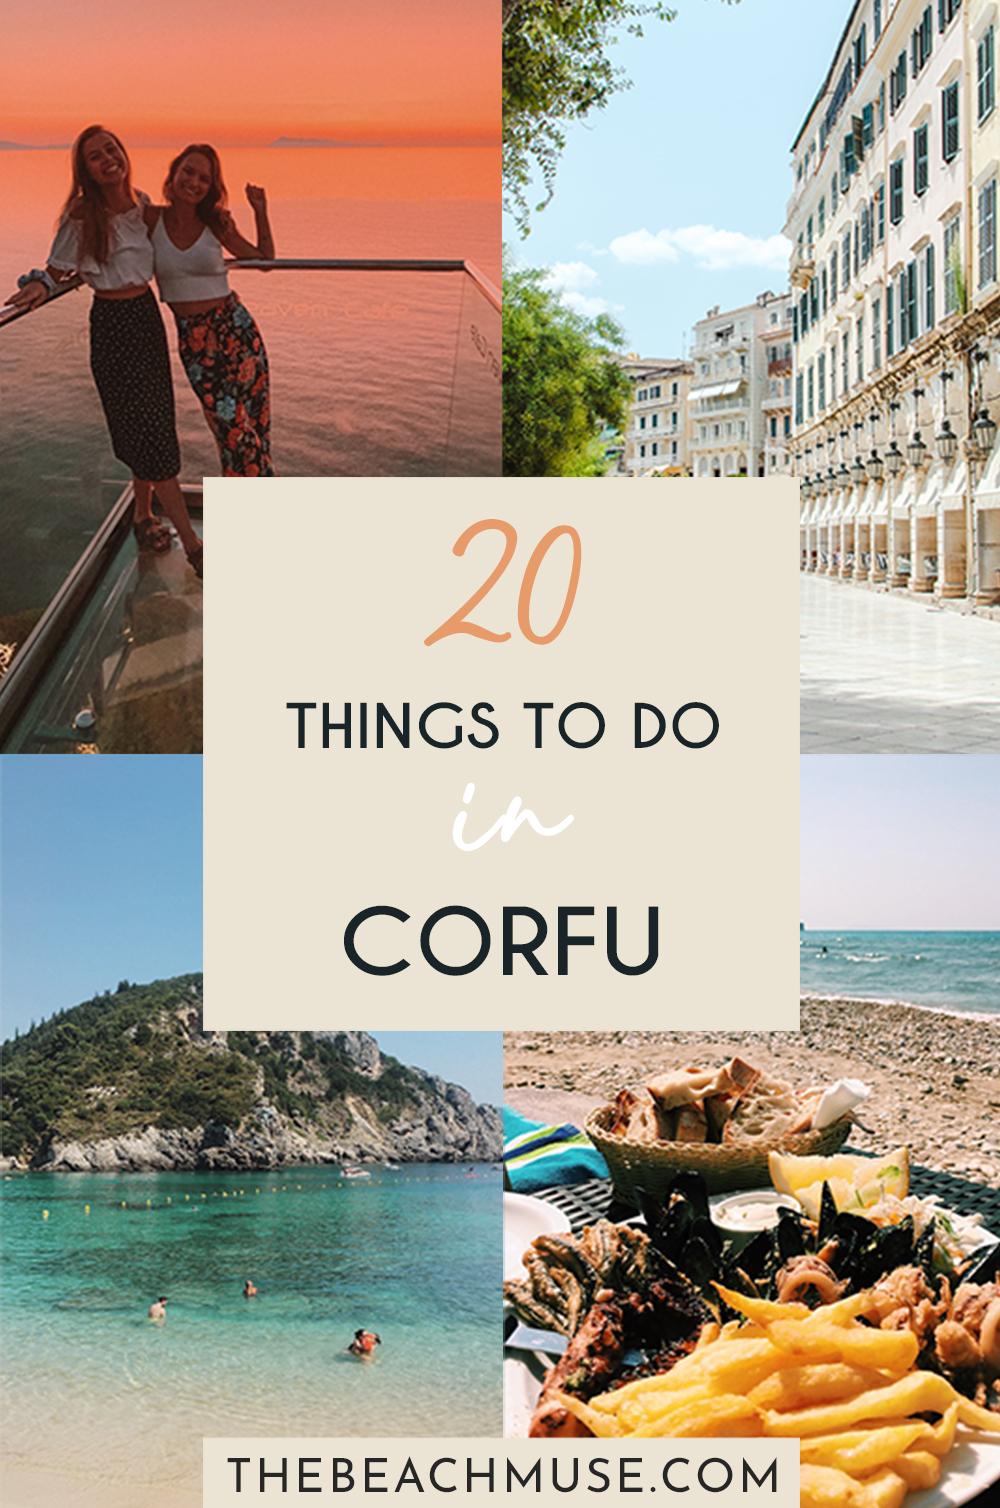 20 things to do in Corfu, Greece